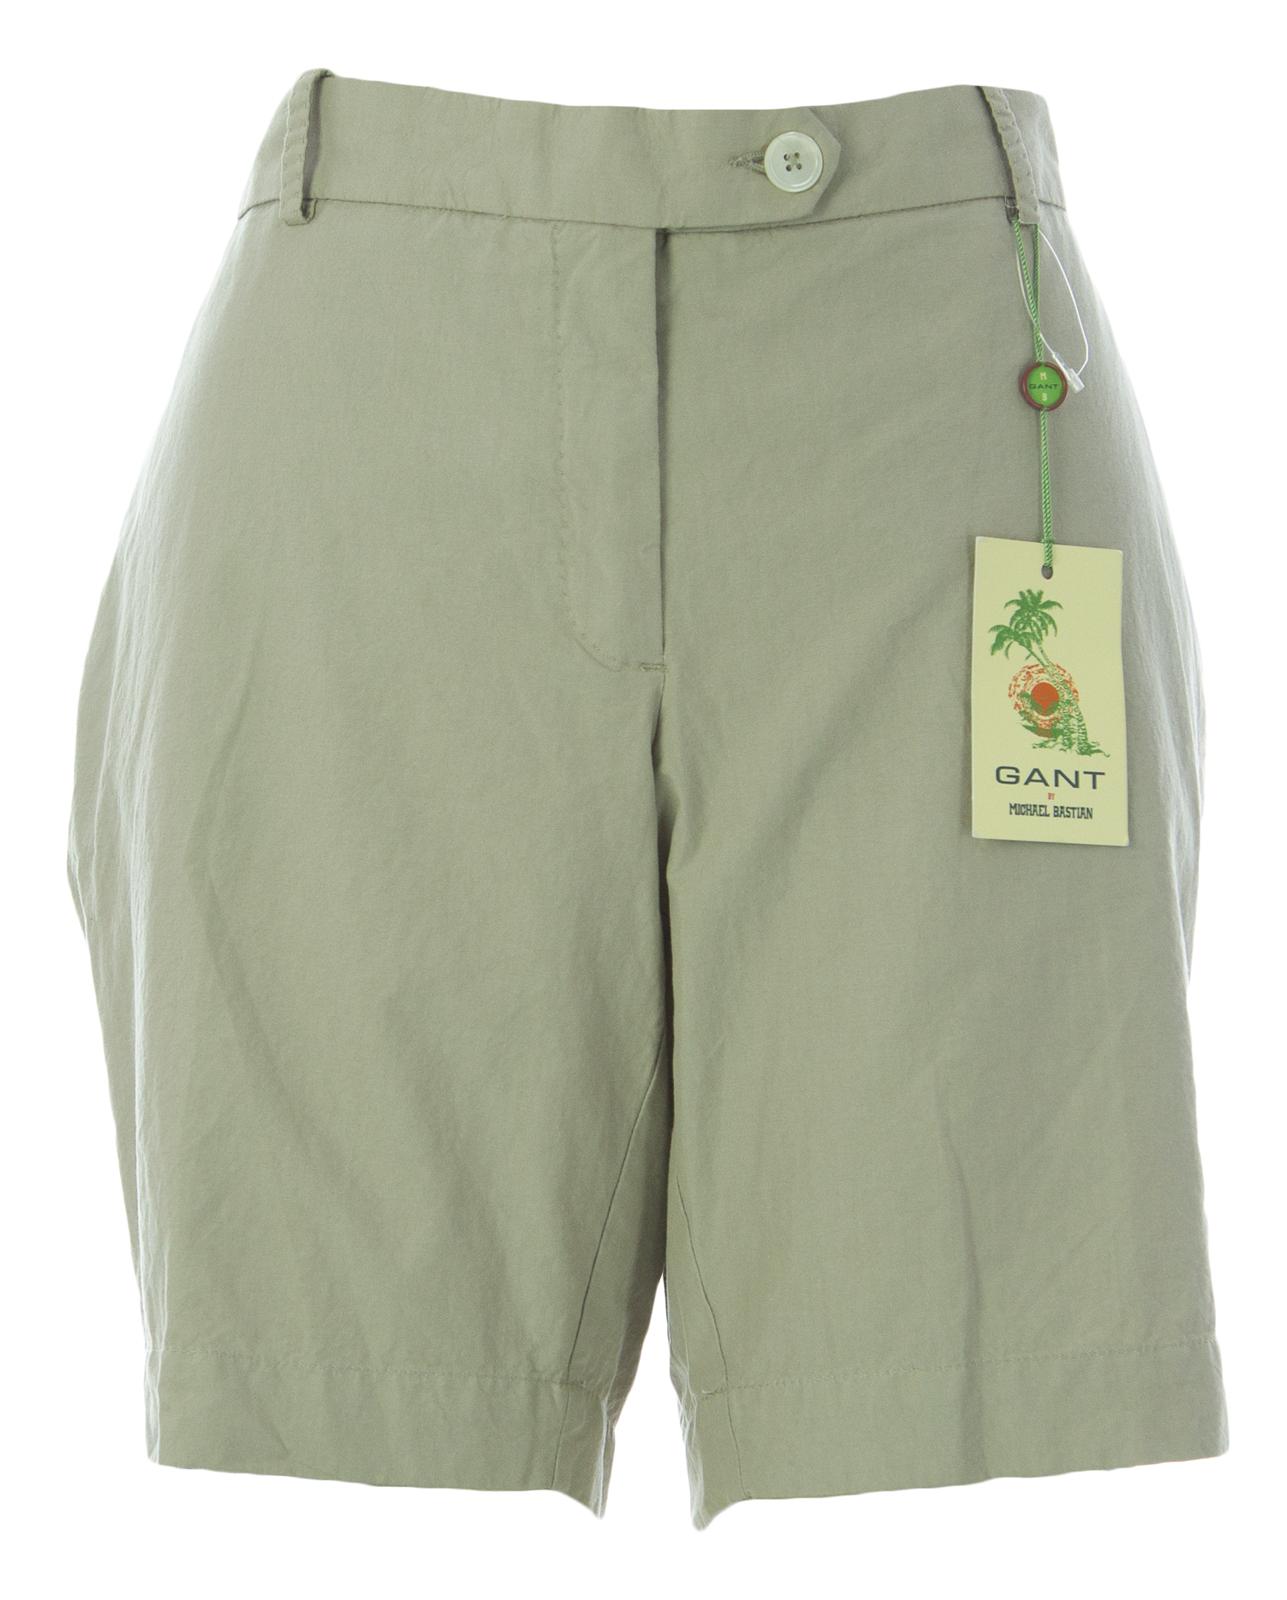 GANT Women's Sandy Beige Cotton MB Boy Shorts 420209 $245 NEW